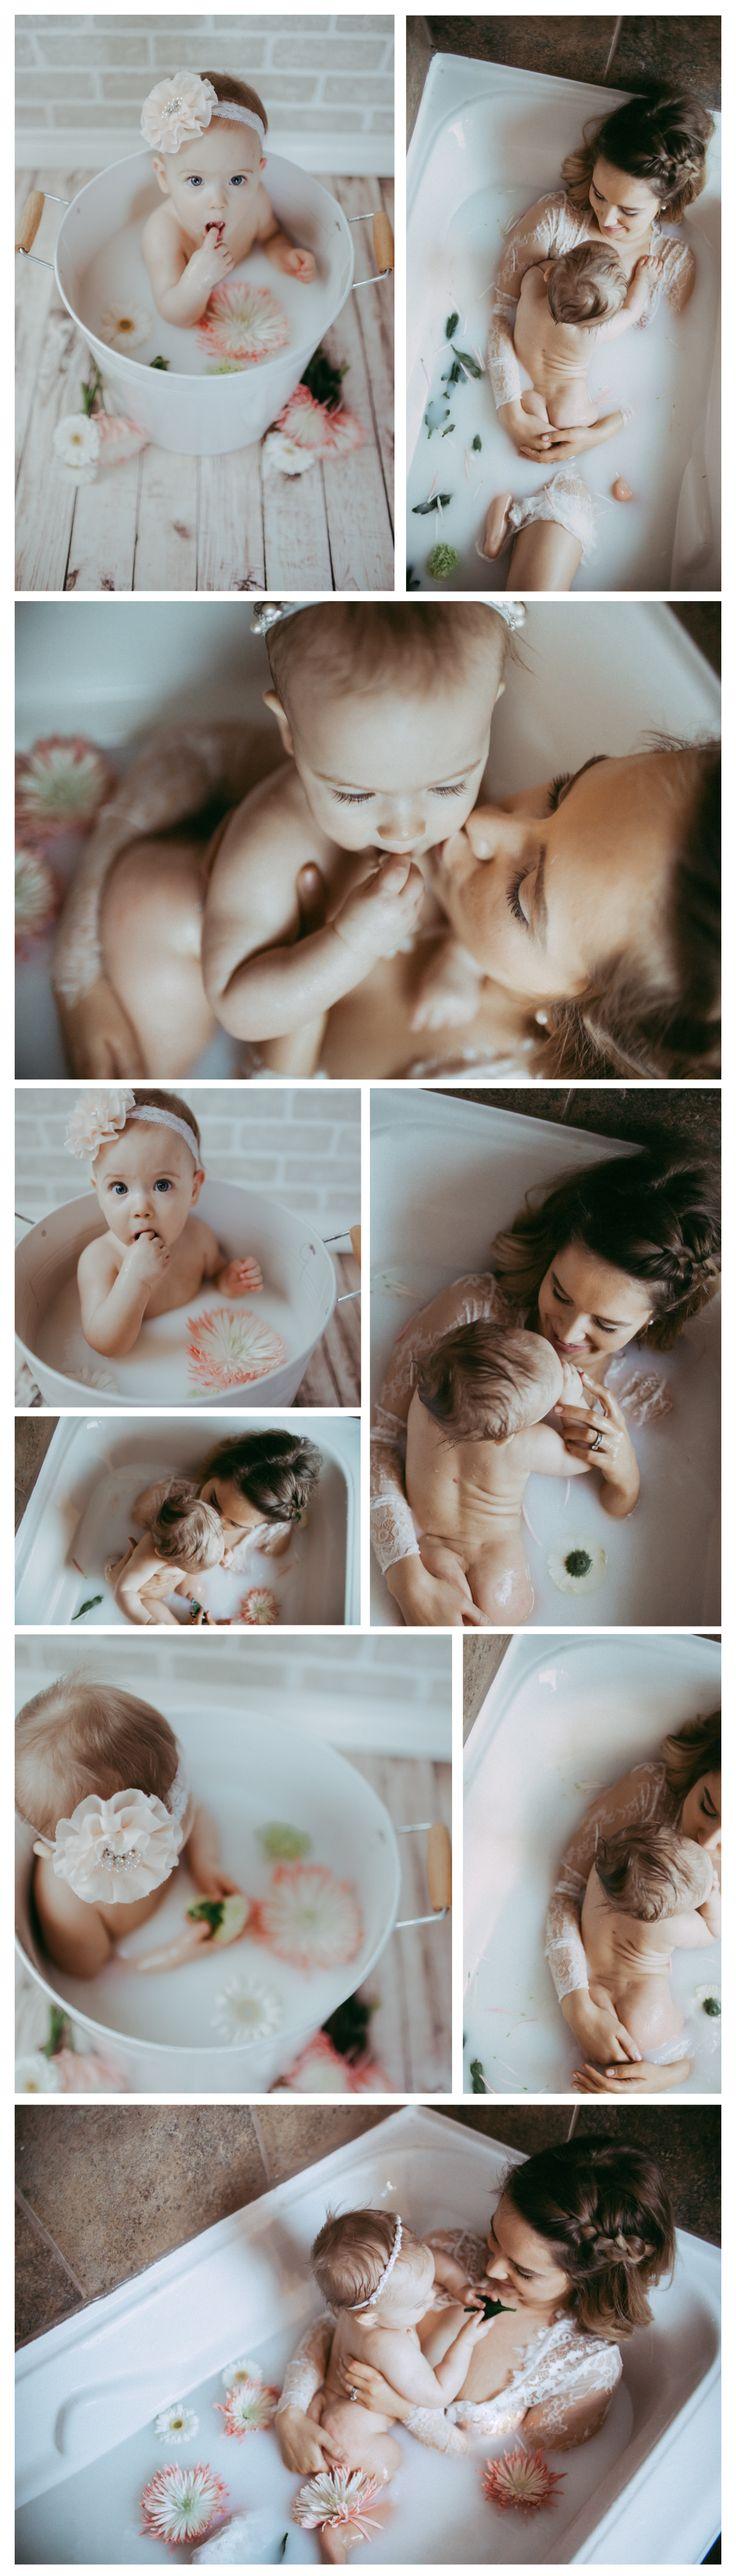 9 month milestone session milk bath mommy & me session Brina Debalinhard Photography